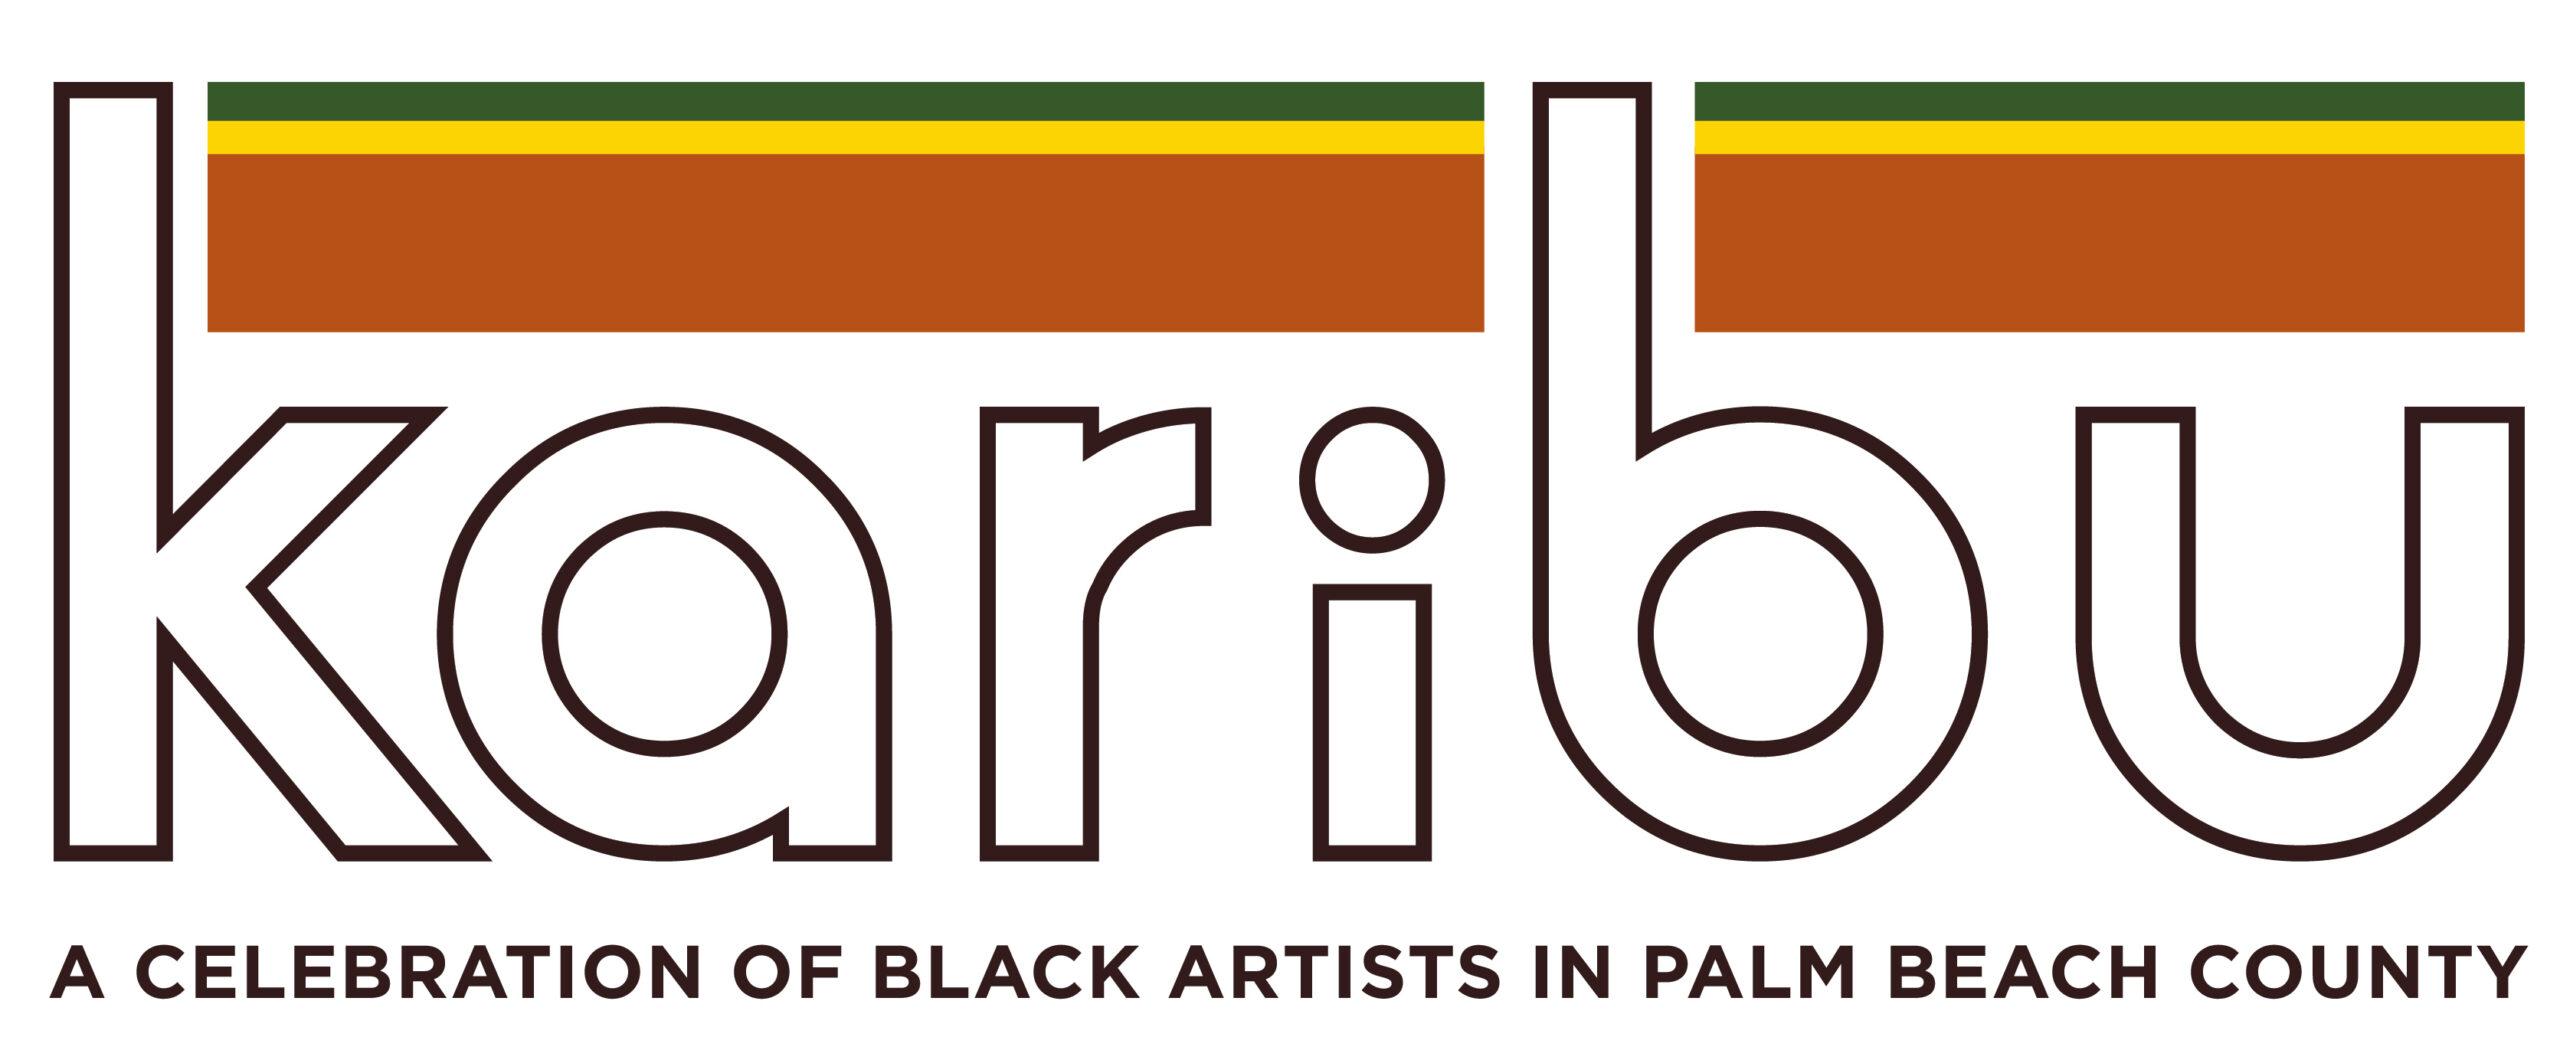 Karibu: a celebration of black artists in Palm Beach County